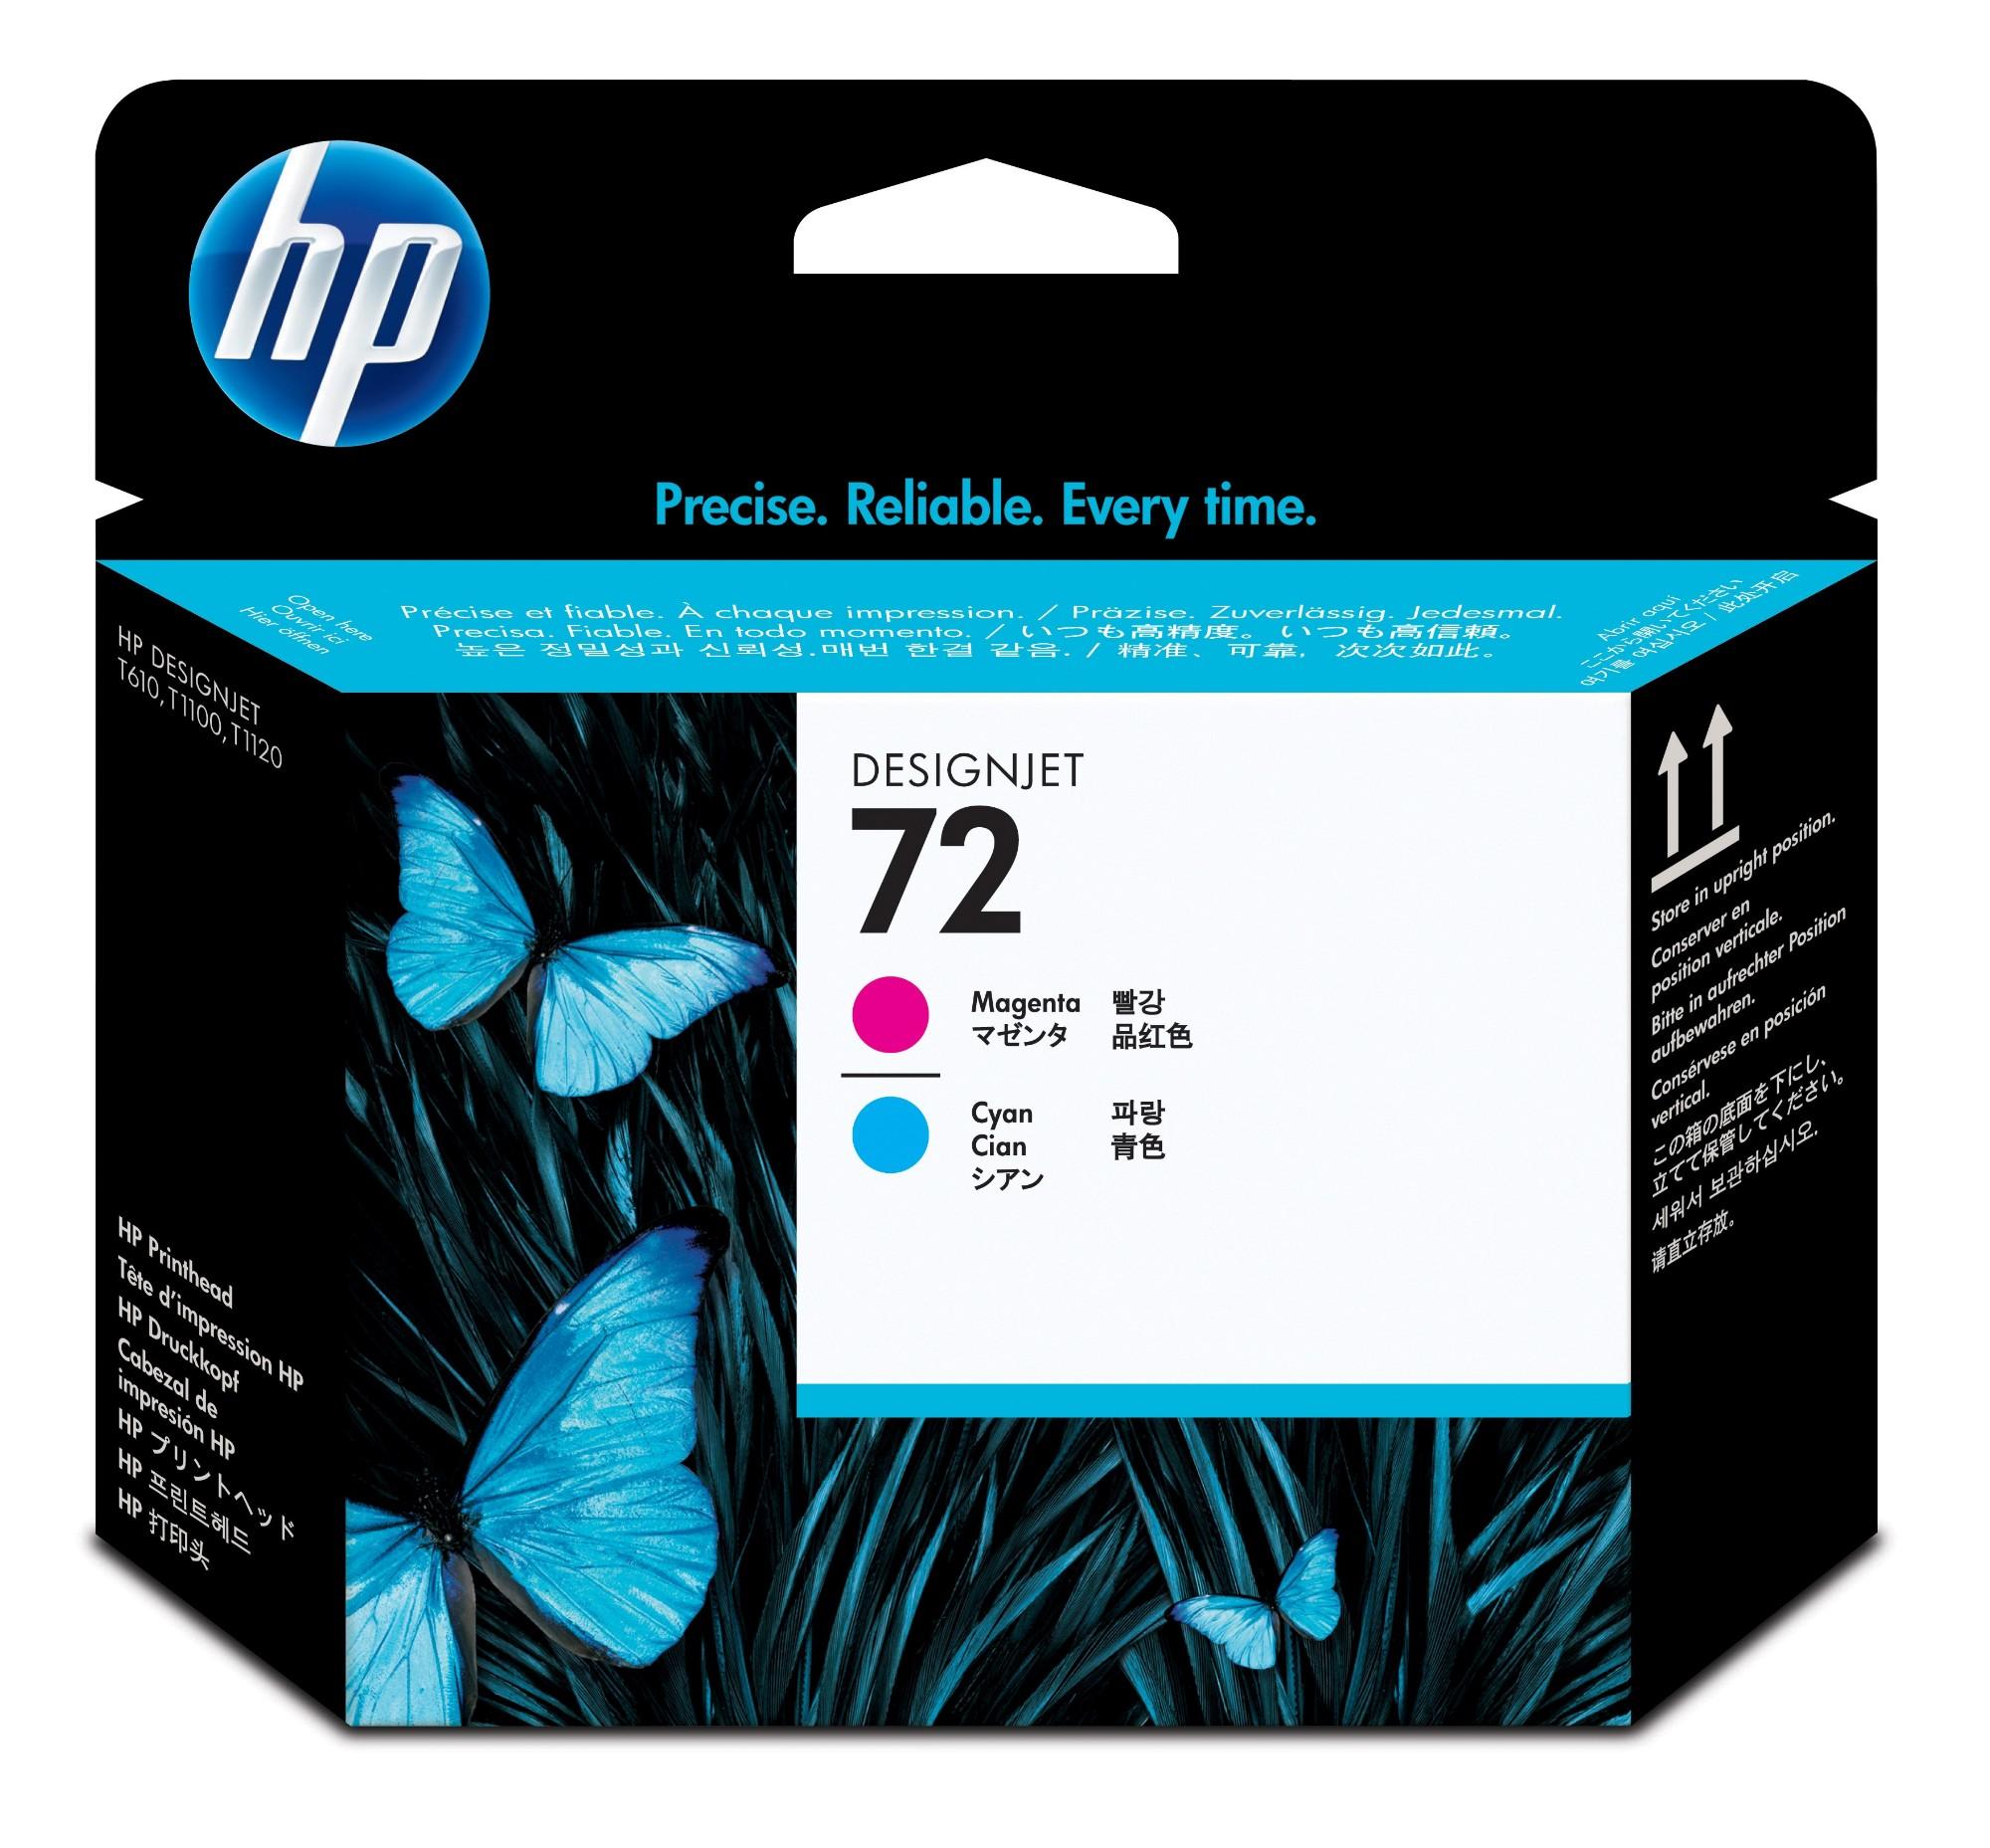 HP 72 magenta/cyaan DesignJet printkop